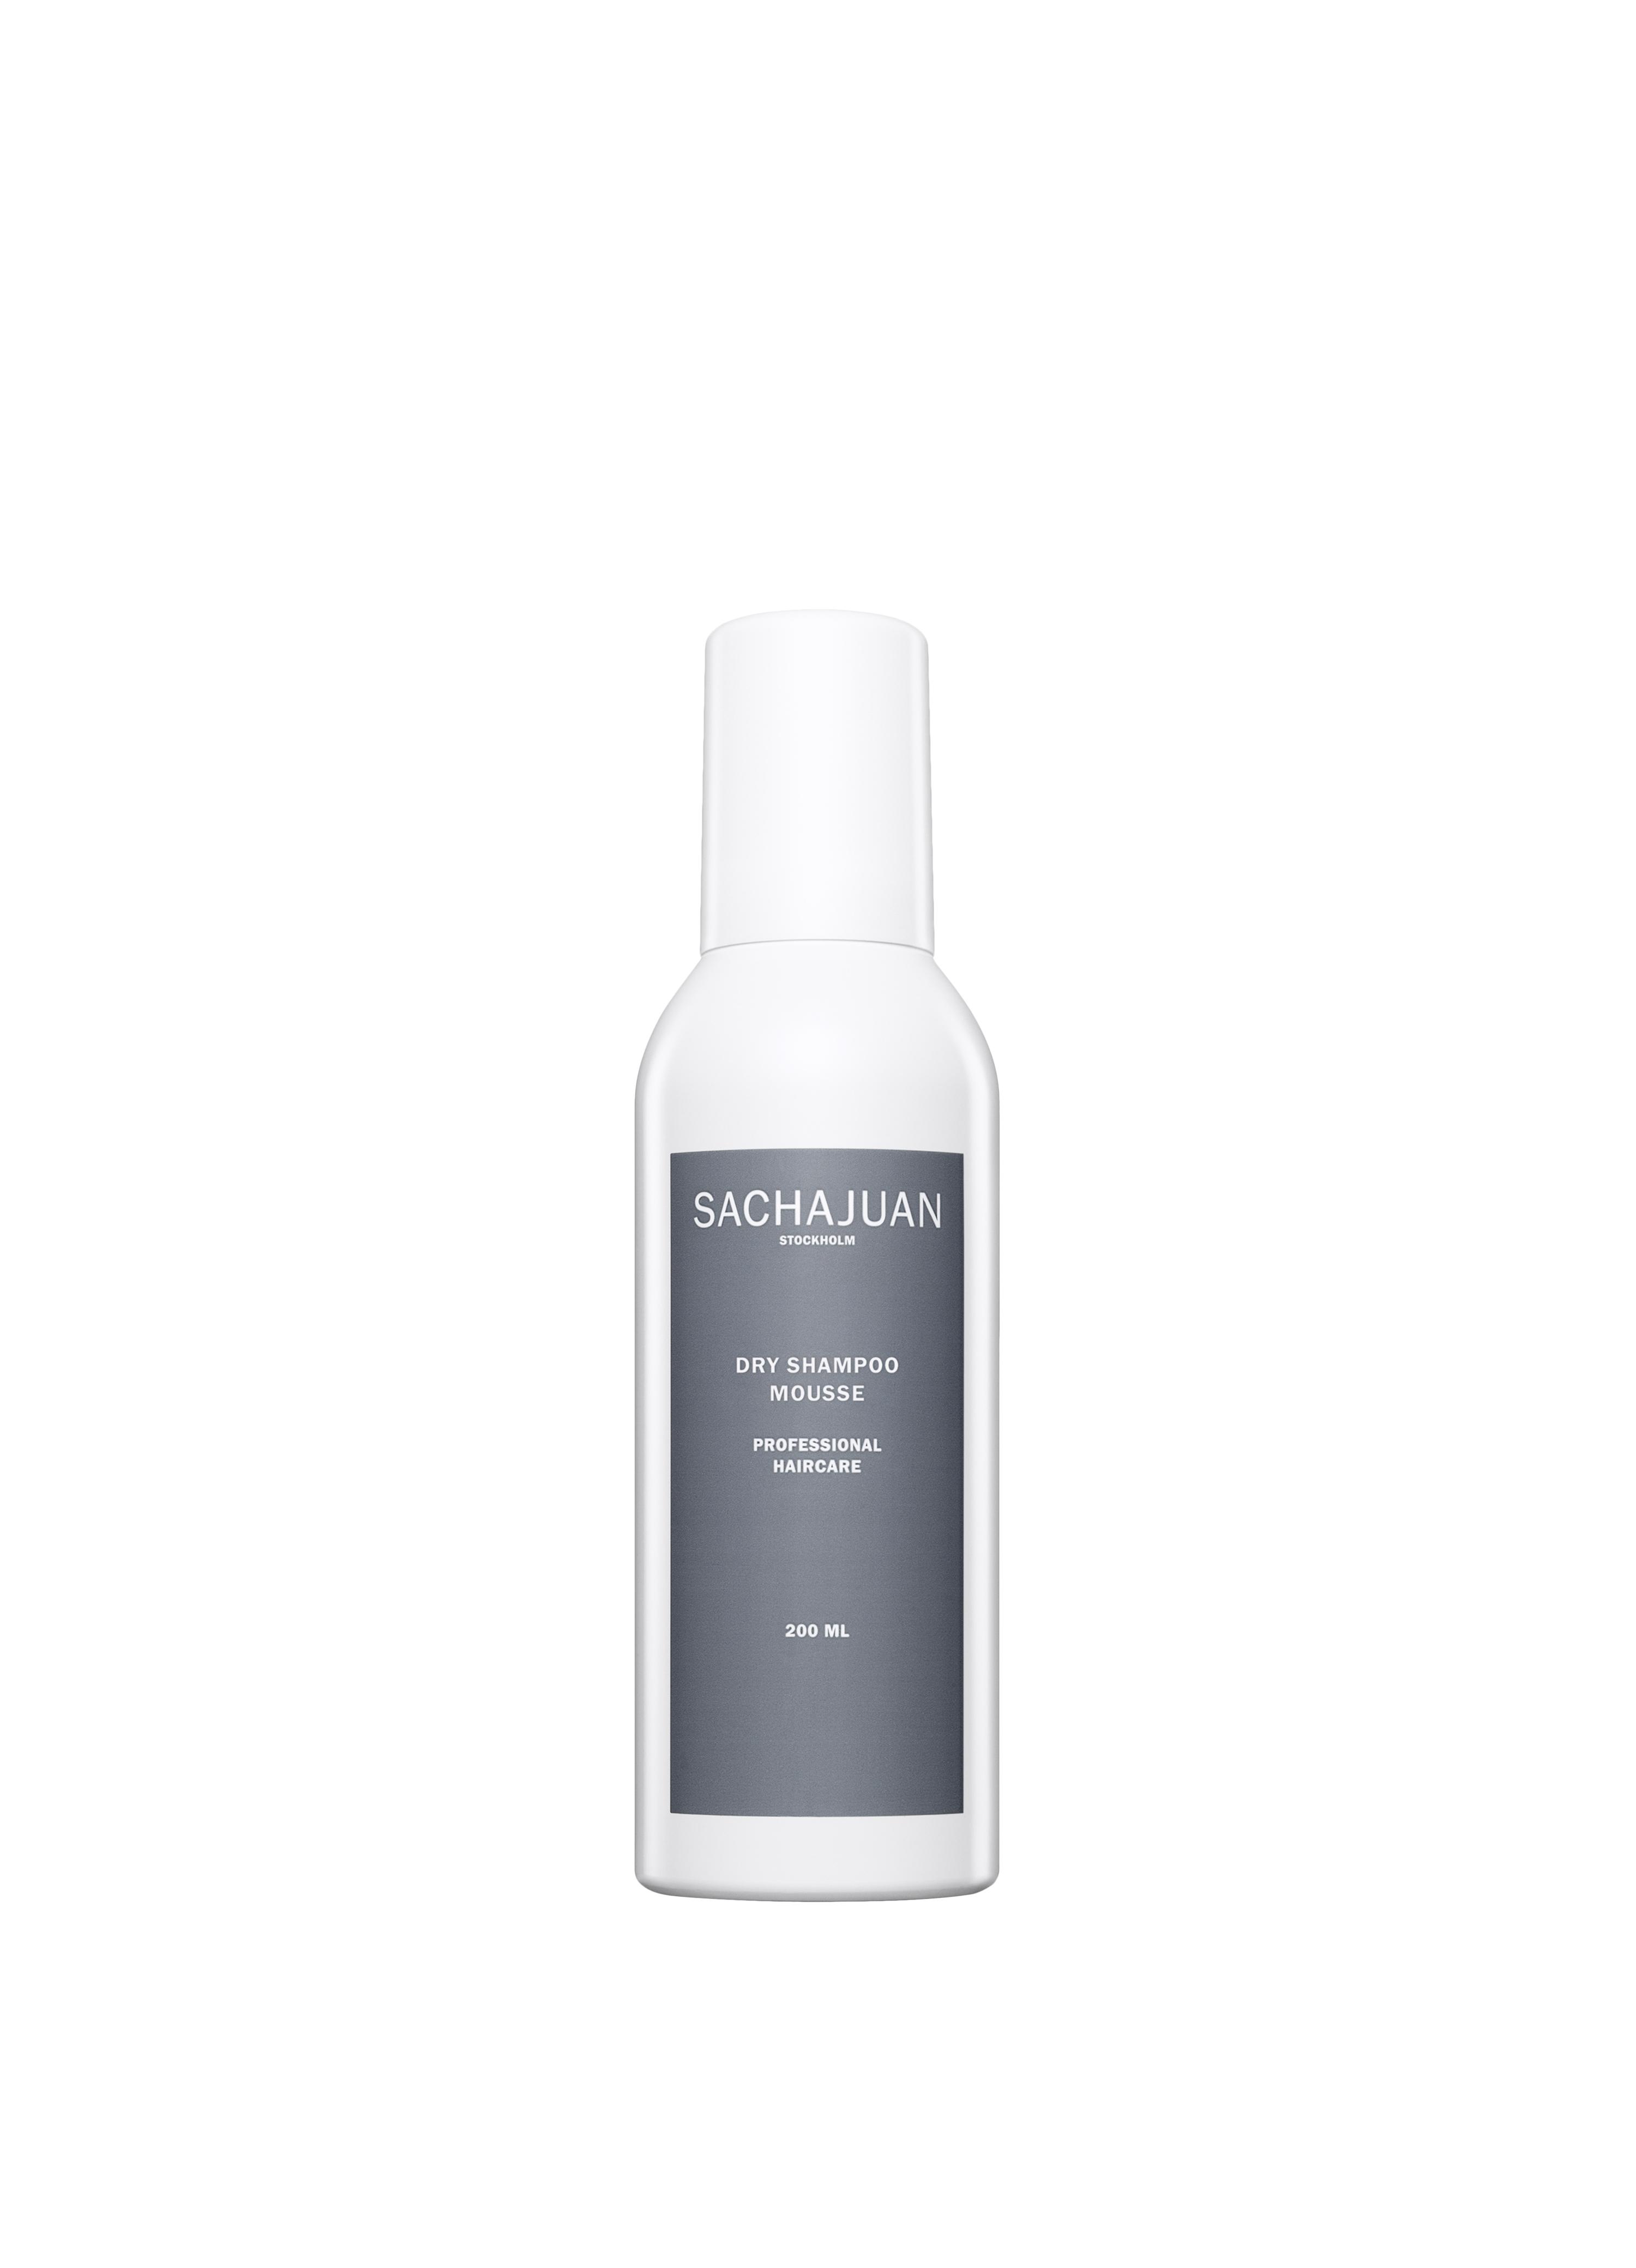 Dry Shampoo Mousse 200ml